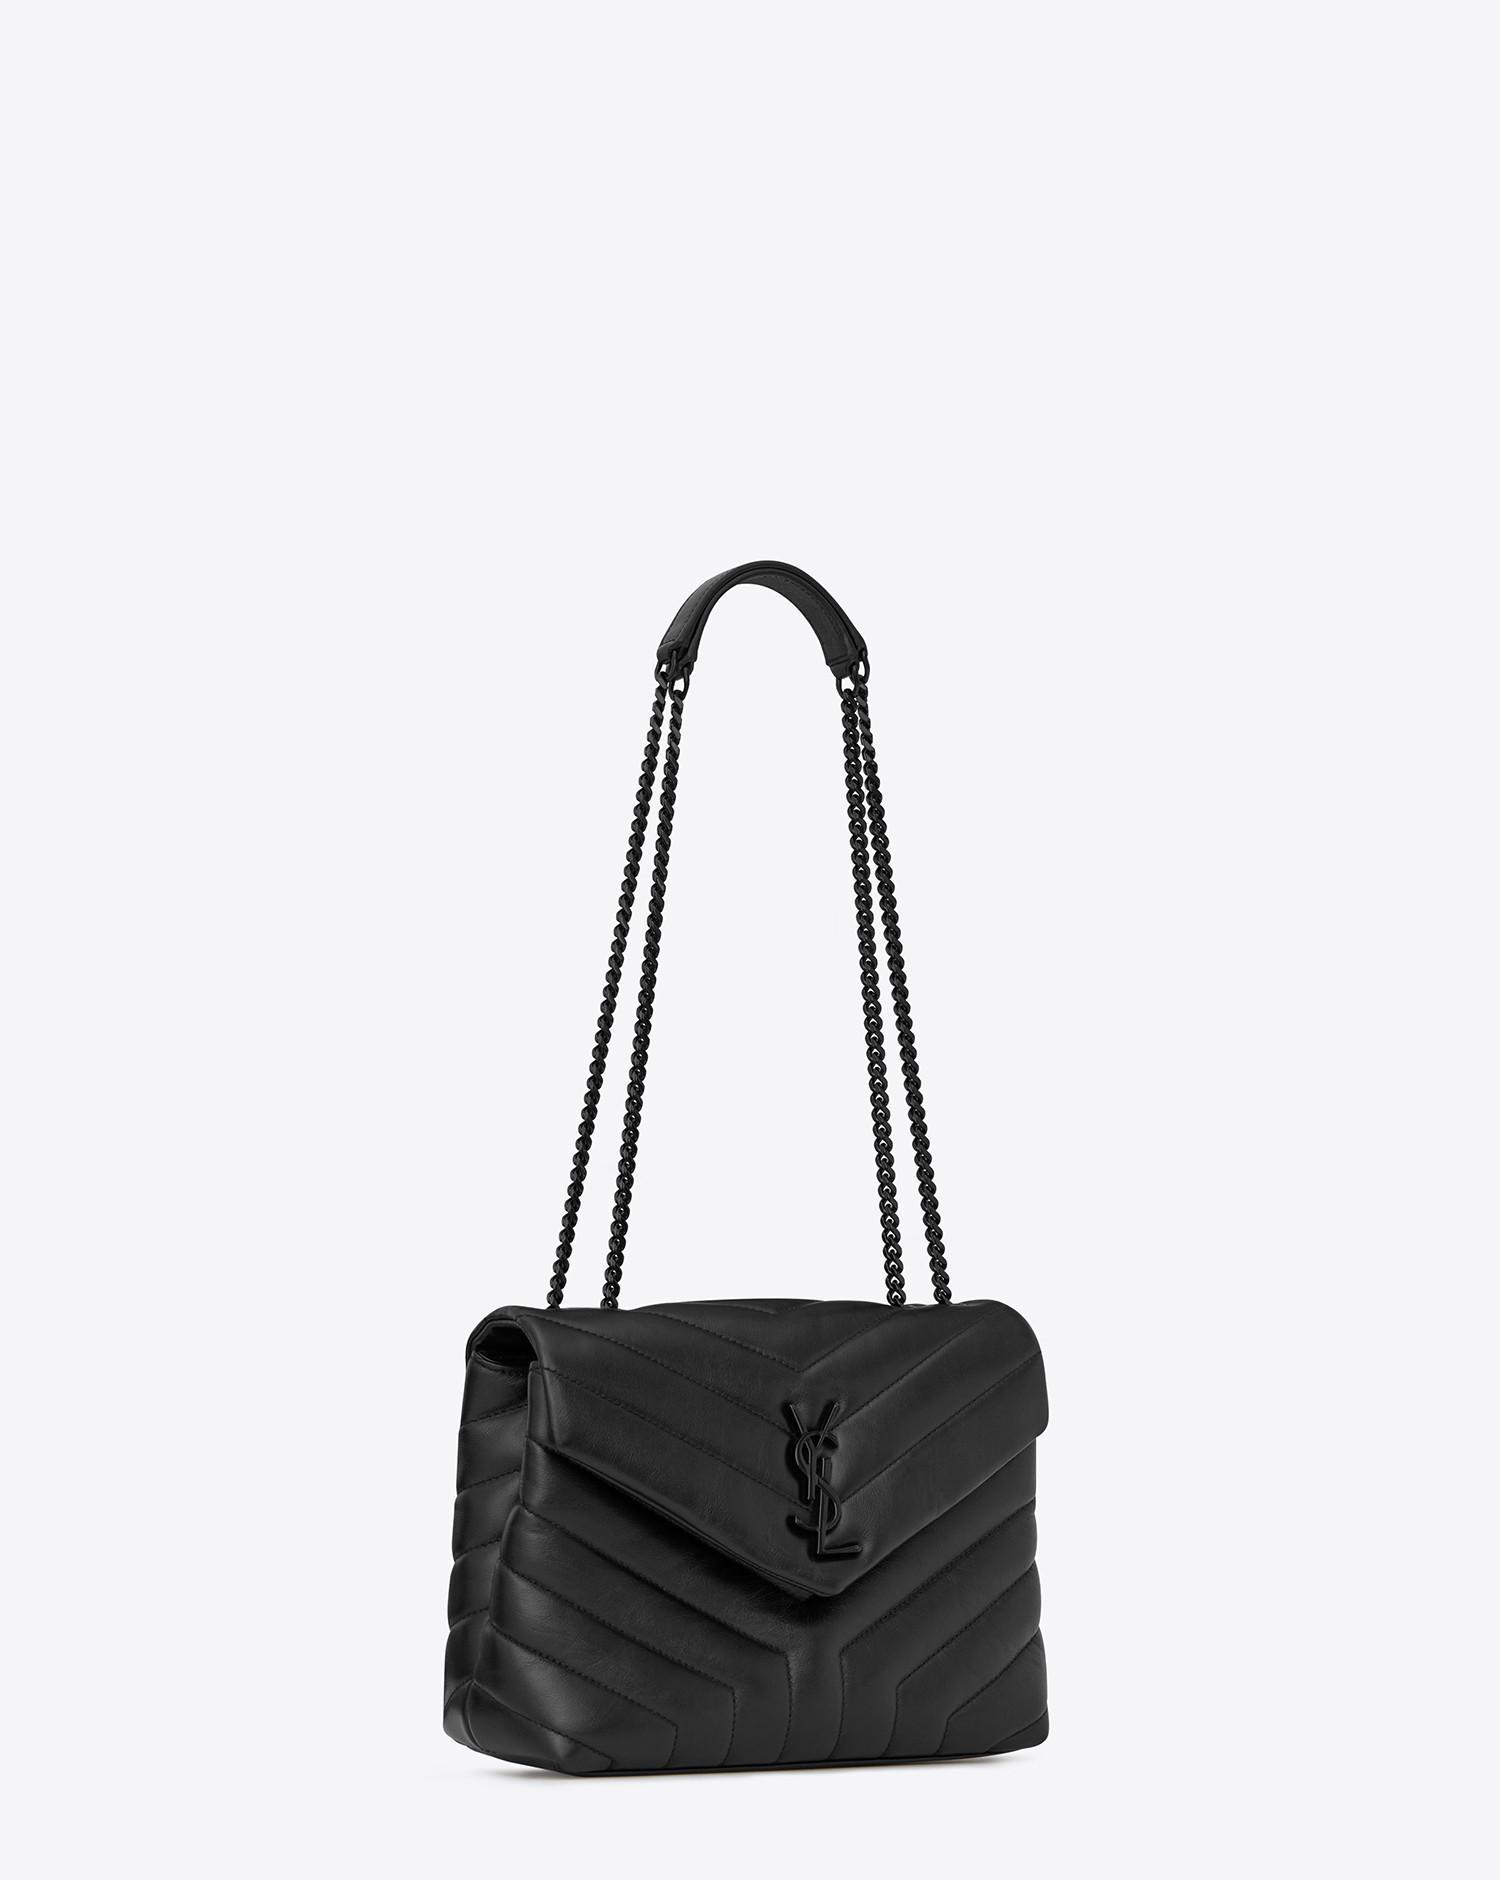 a38d13a5af18 Lyst - Saint Laurent Monogramme Loulou in Black